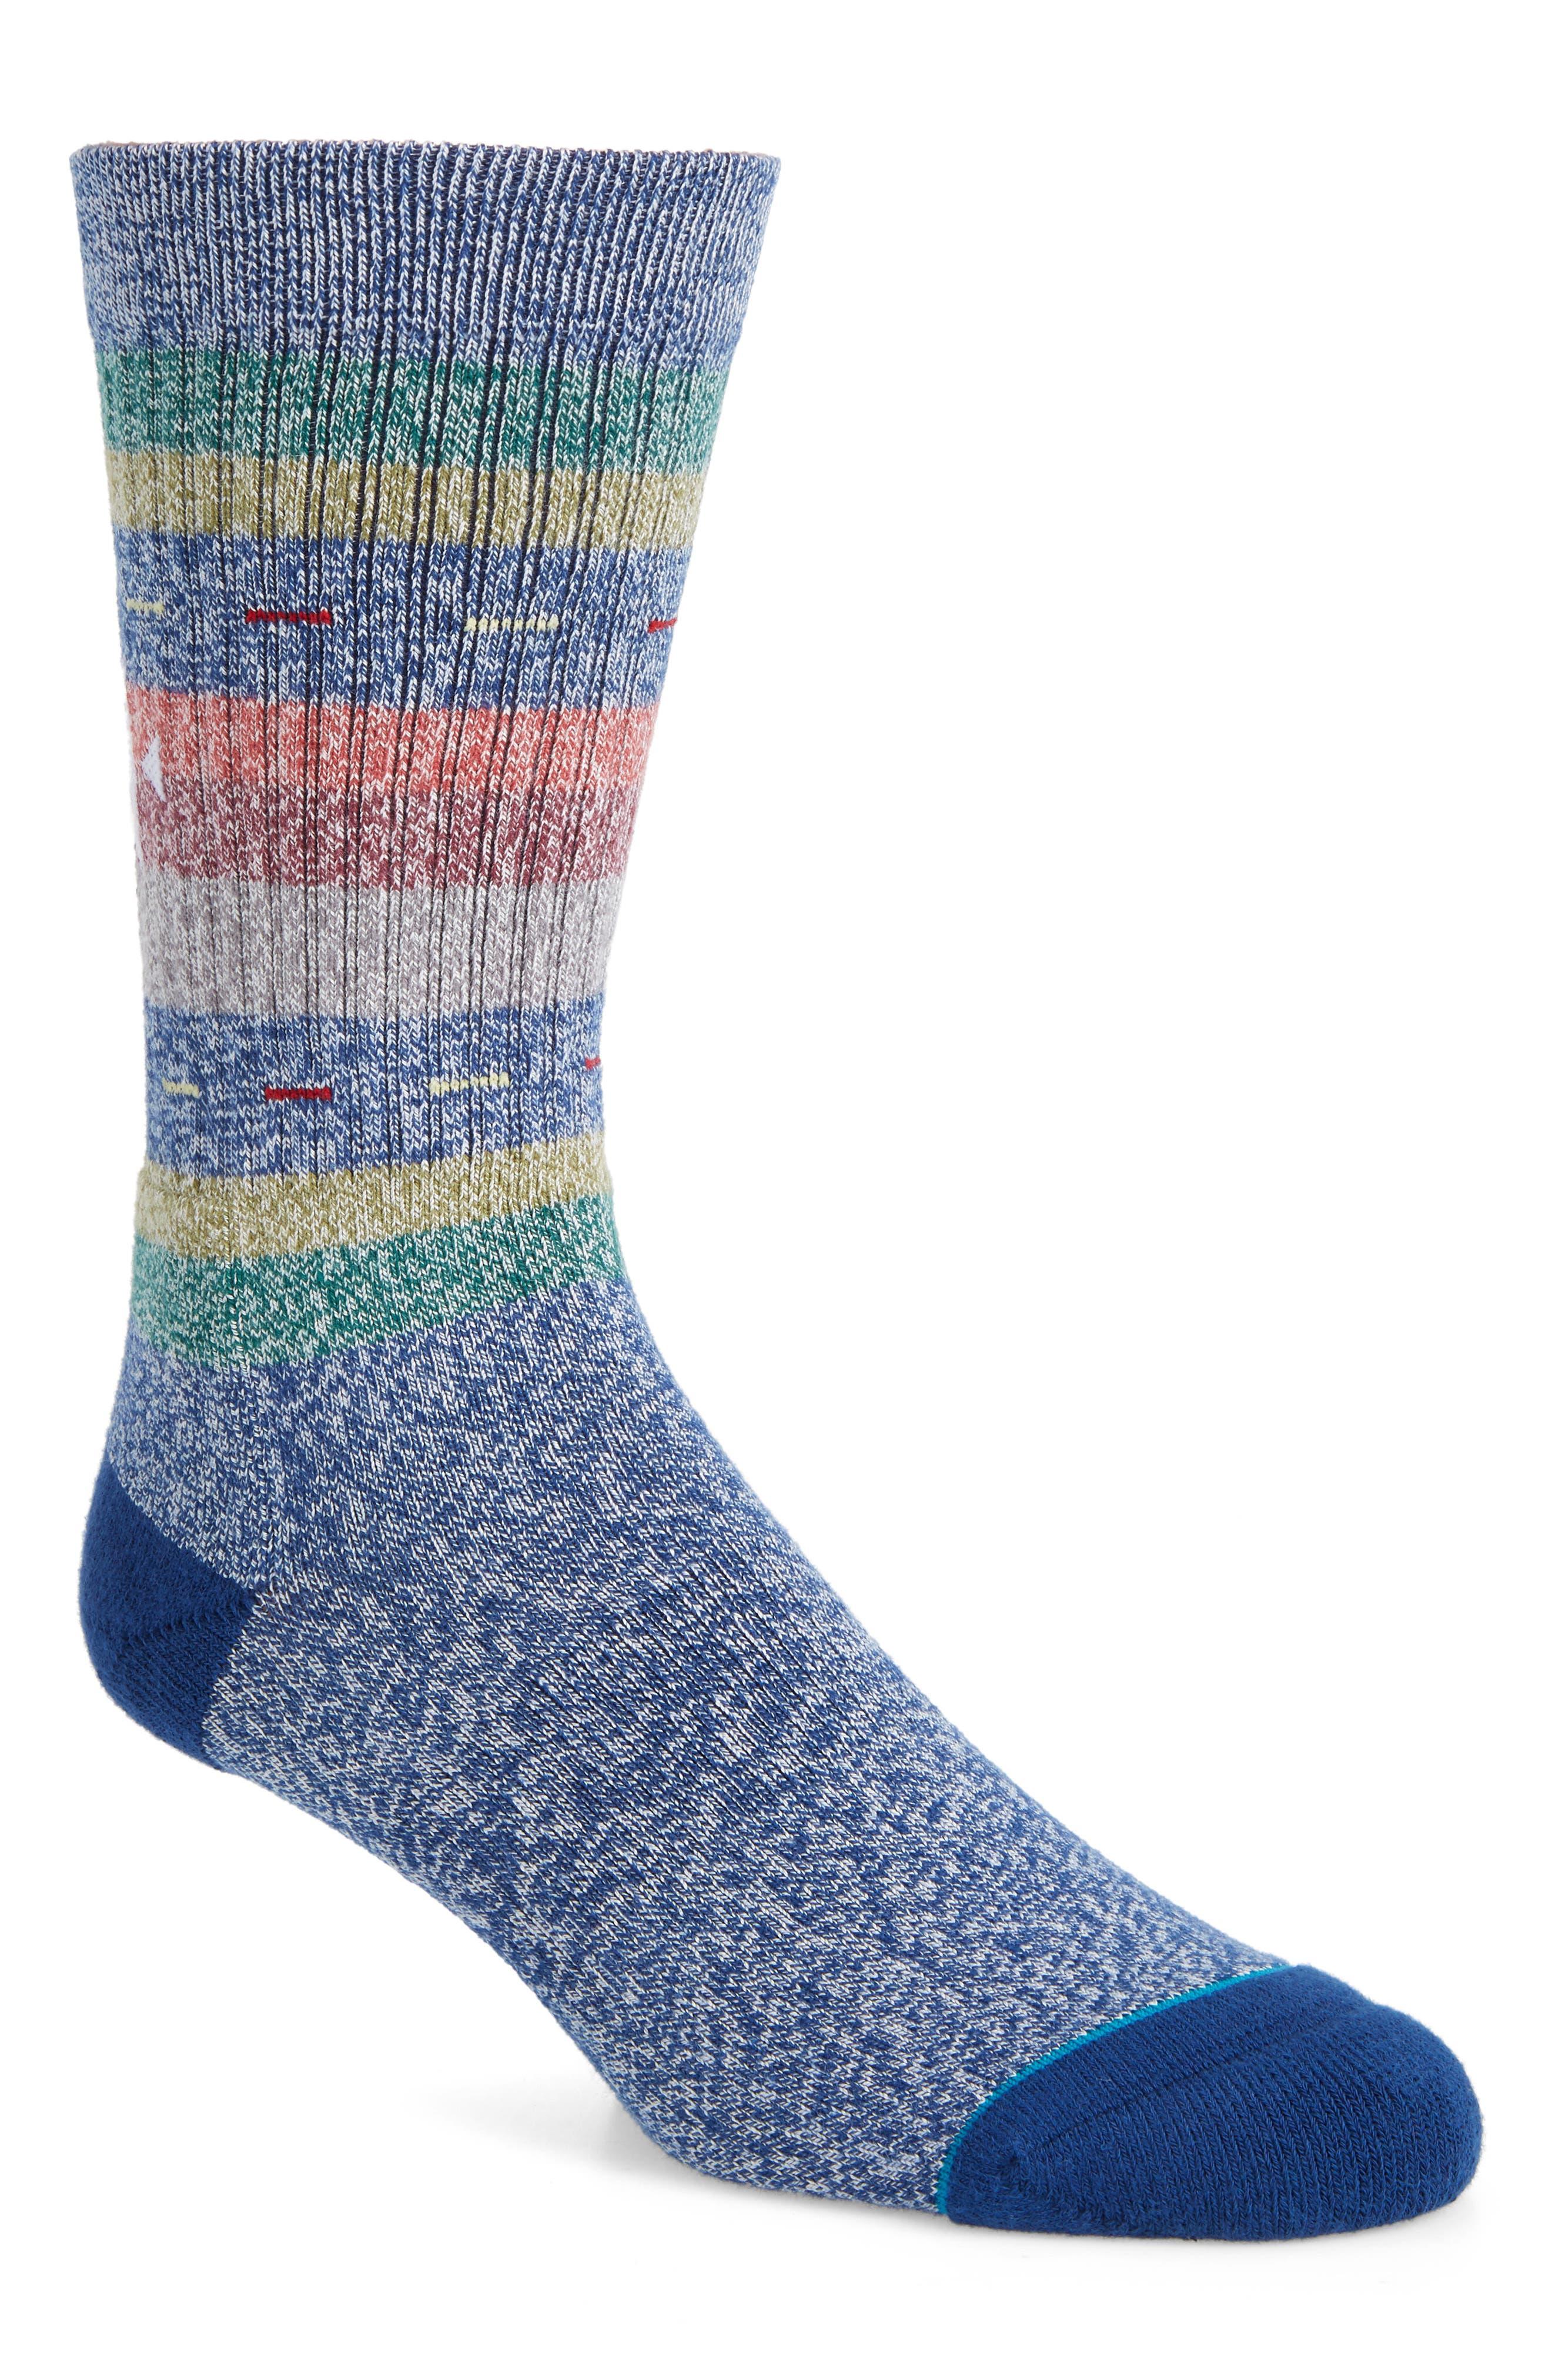 Vaucluse Stripe Socks,                         Main,                         color, 410